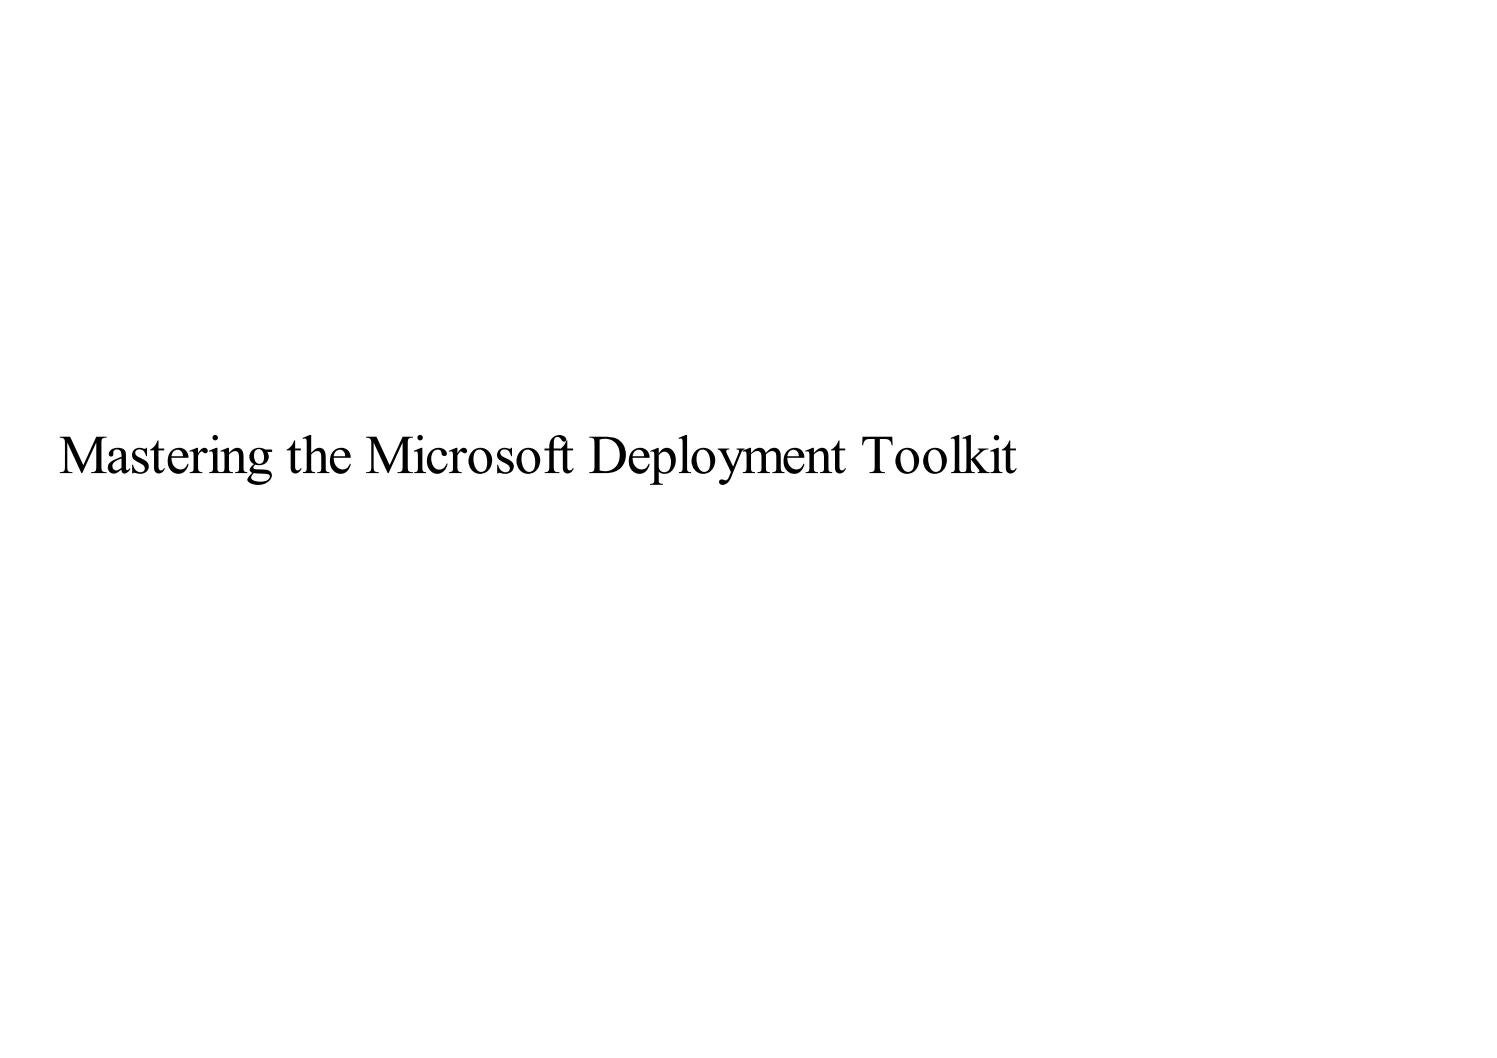 Mastering the Microsoft Deployment Toolkit by lokita - issuu